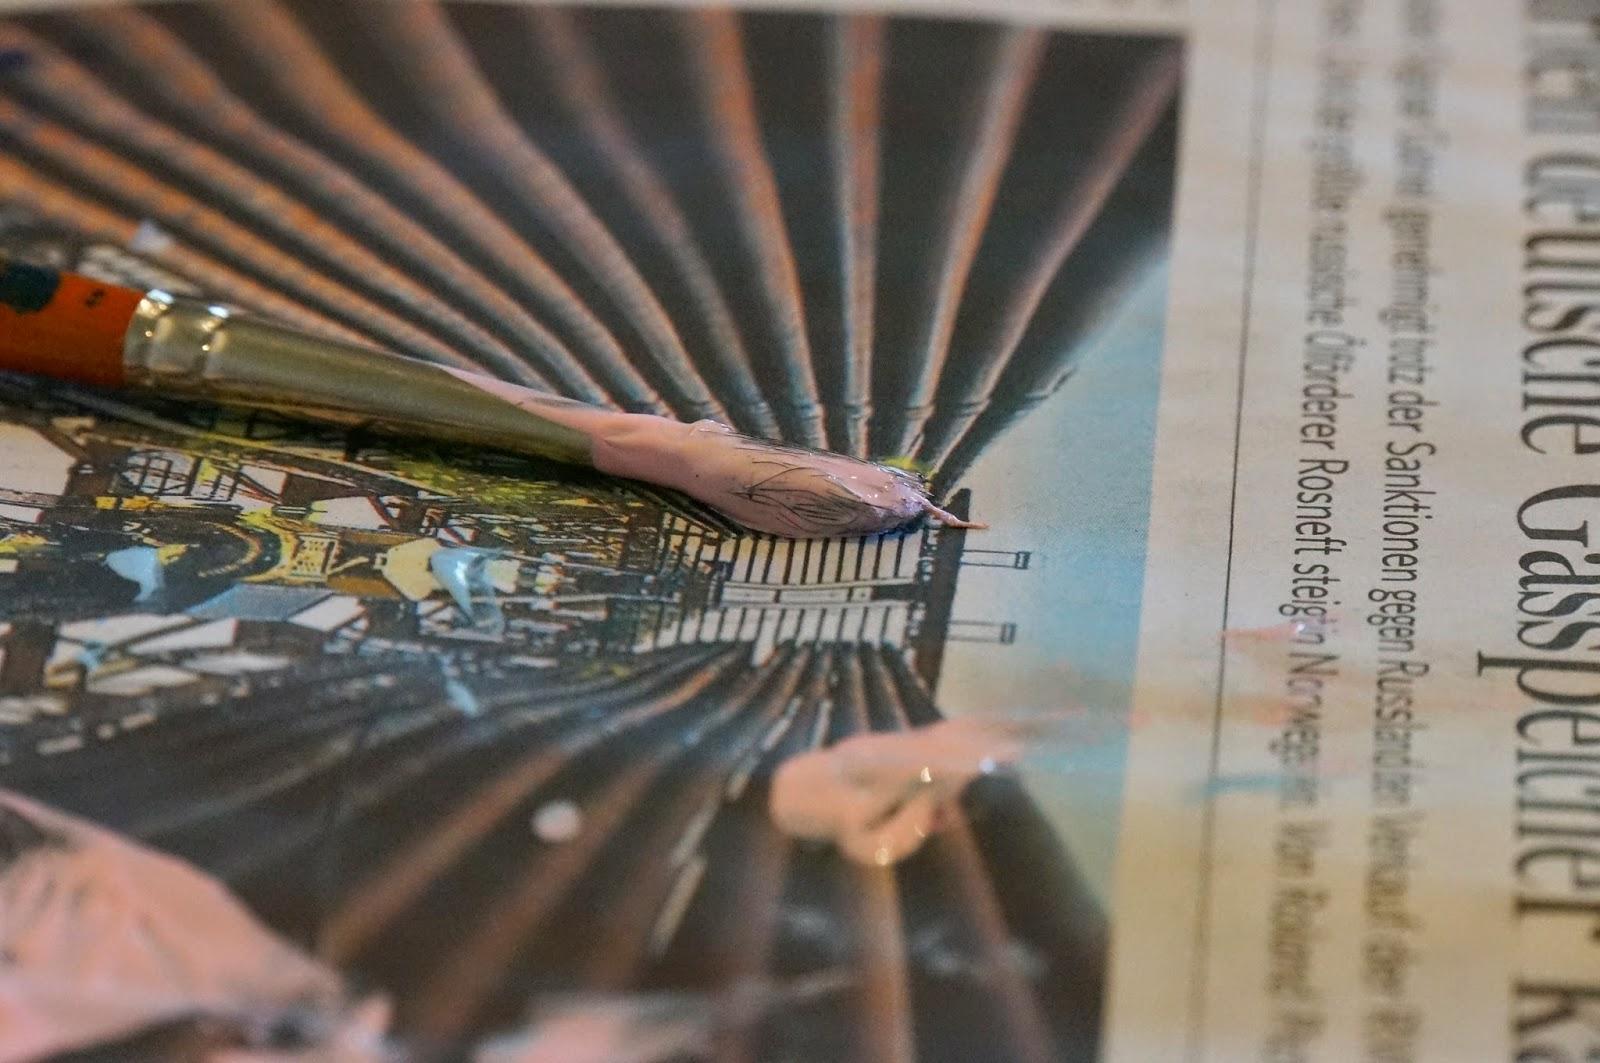 stadtlandjob Zeitung mit Pinsel